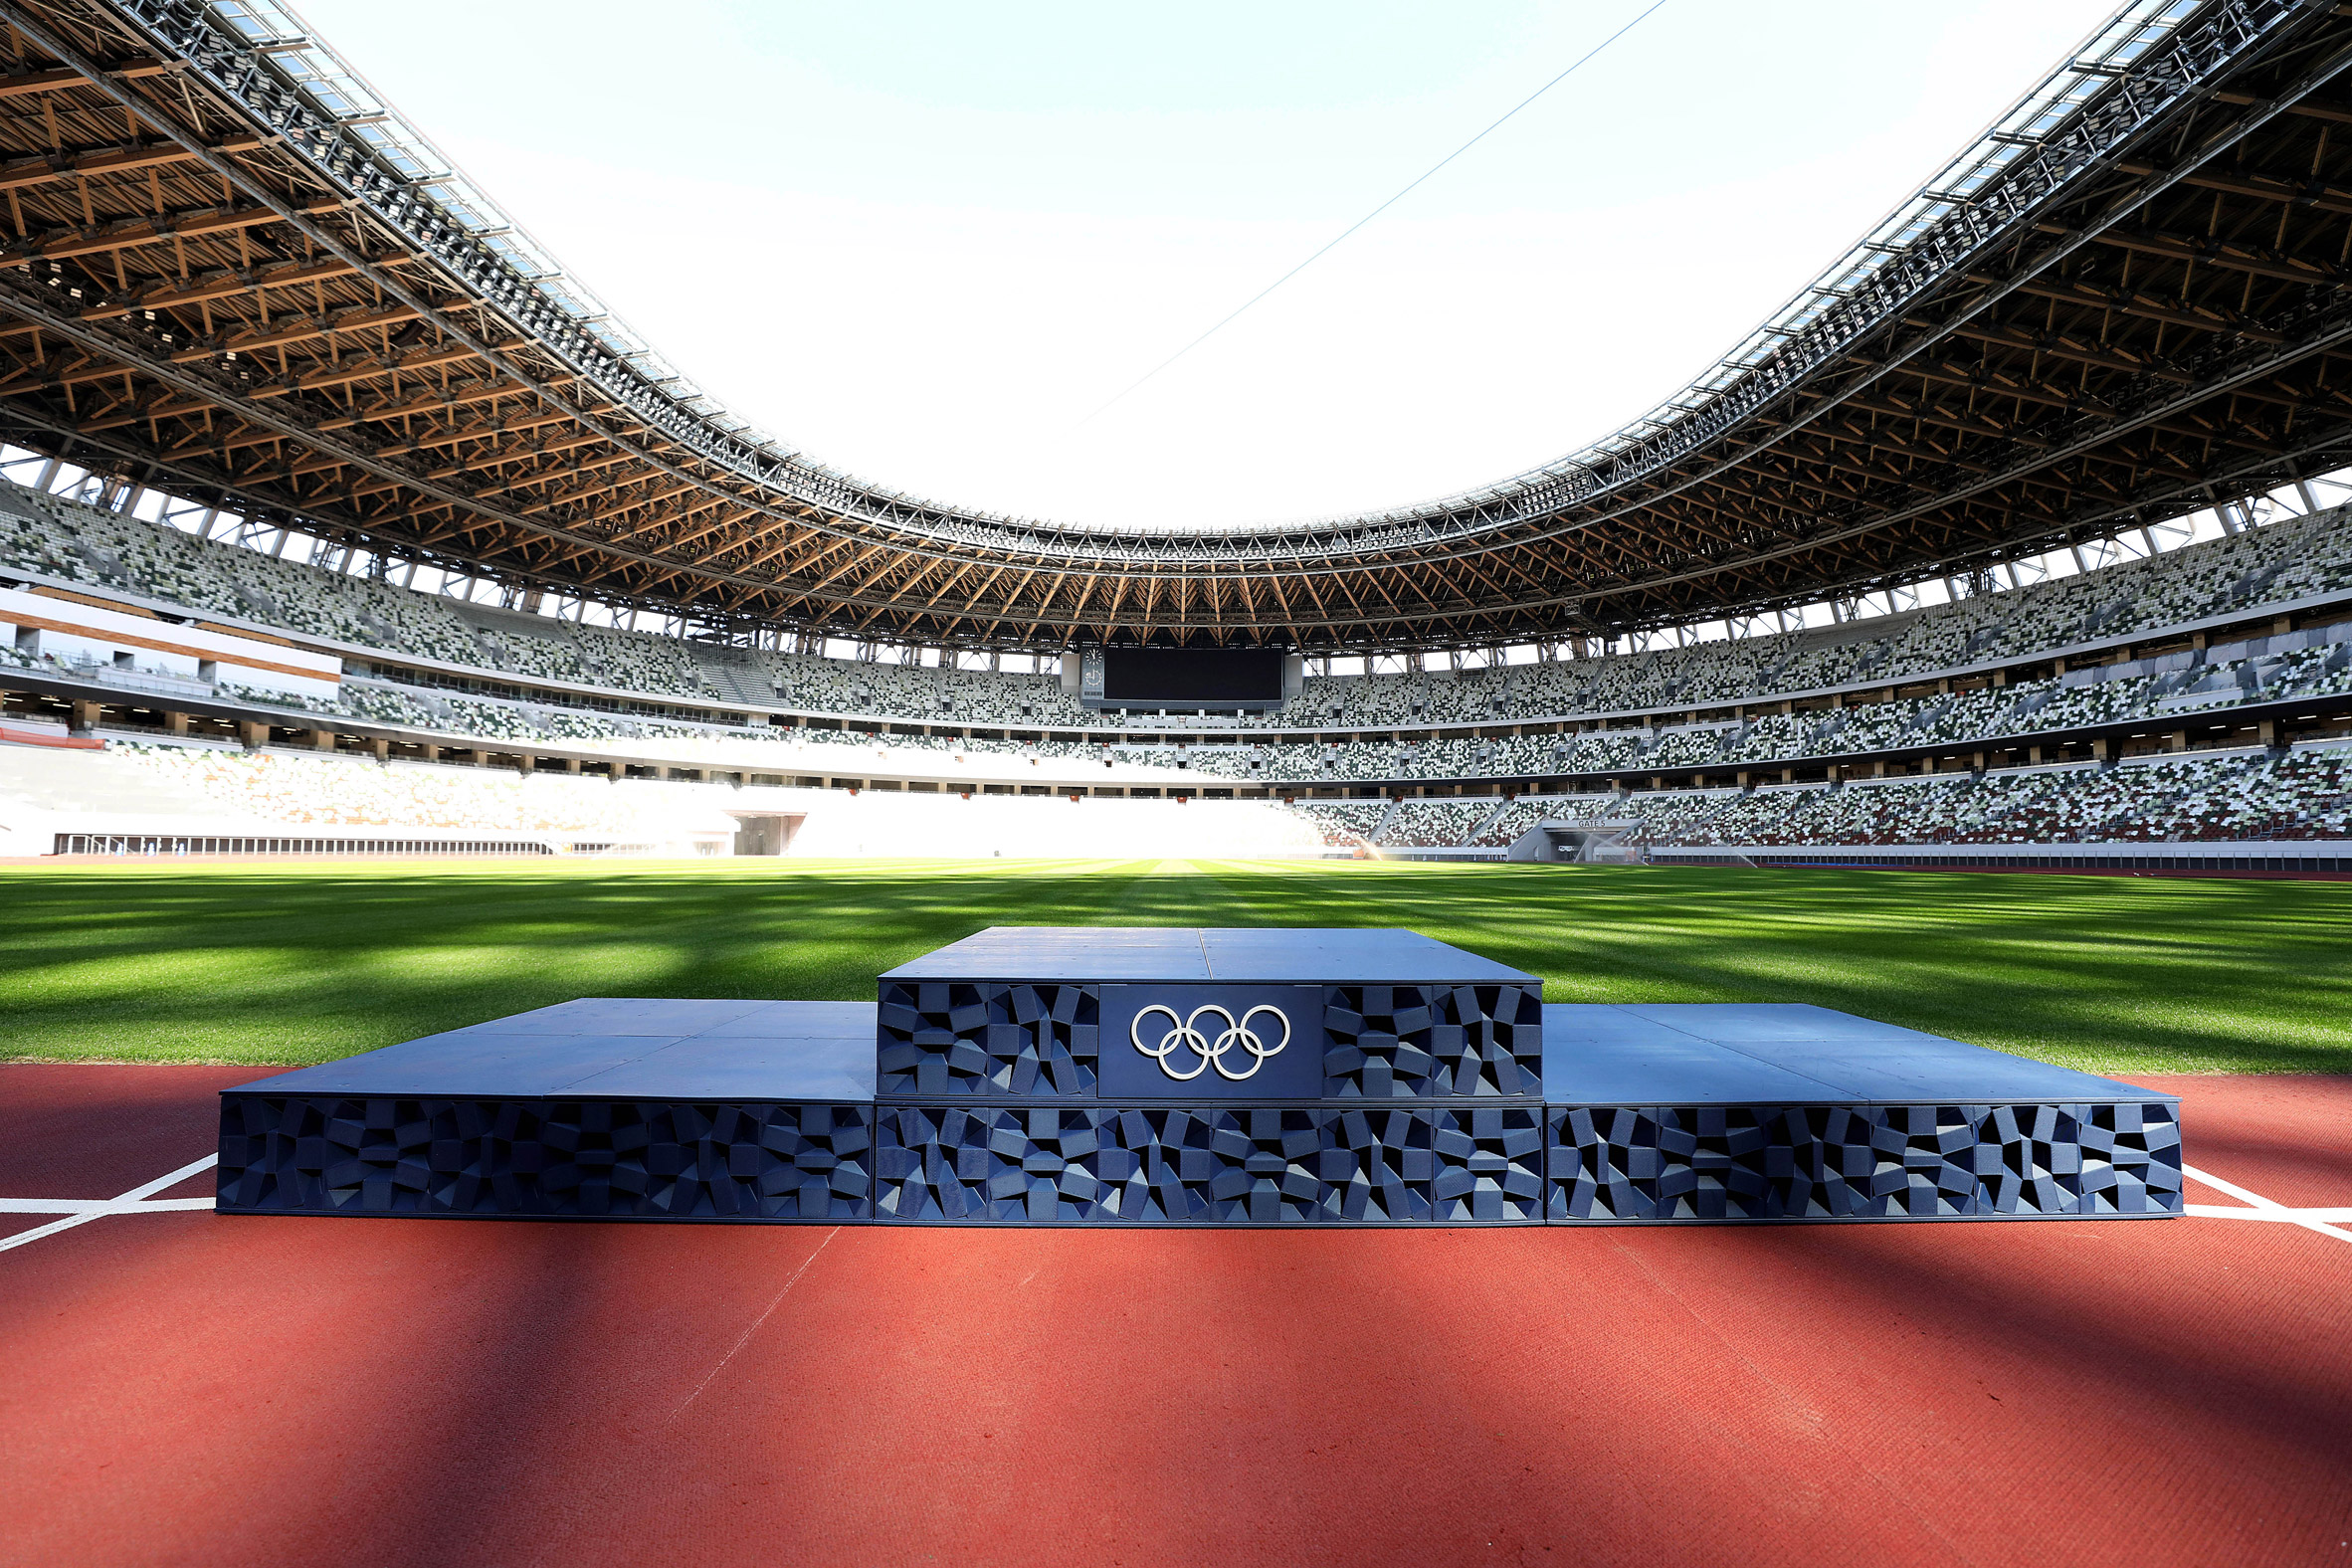 3d-printed Podium in a sports stadium